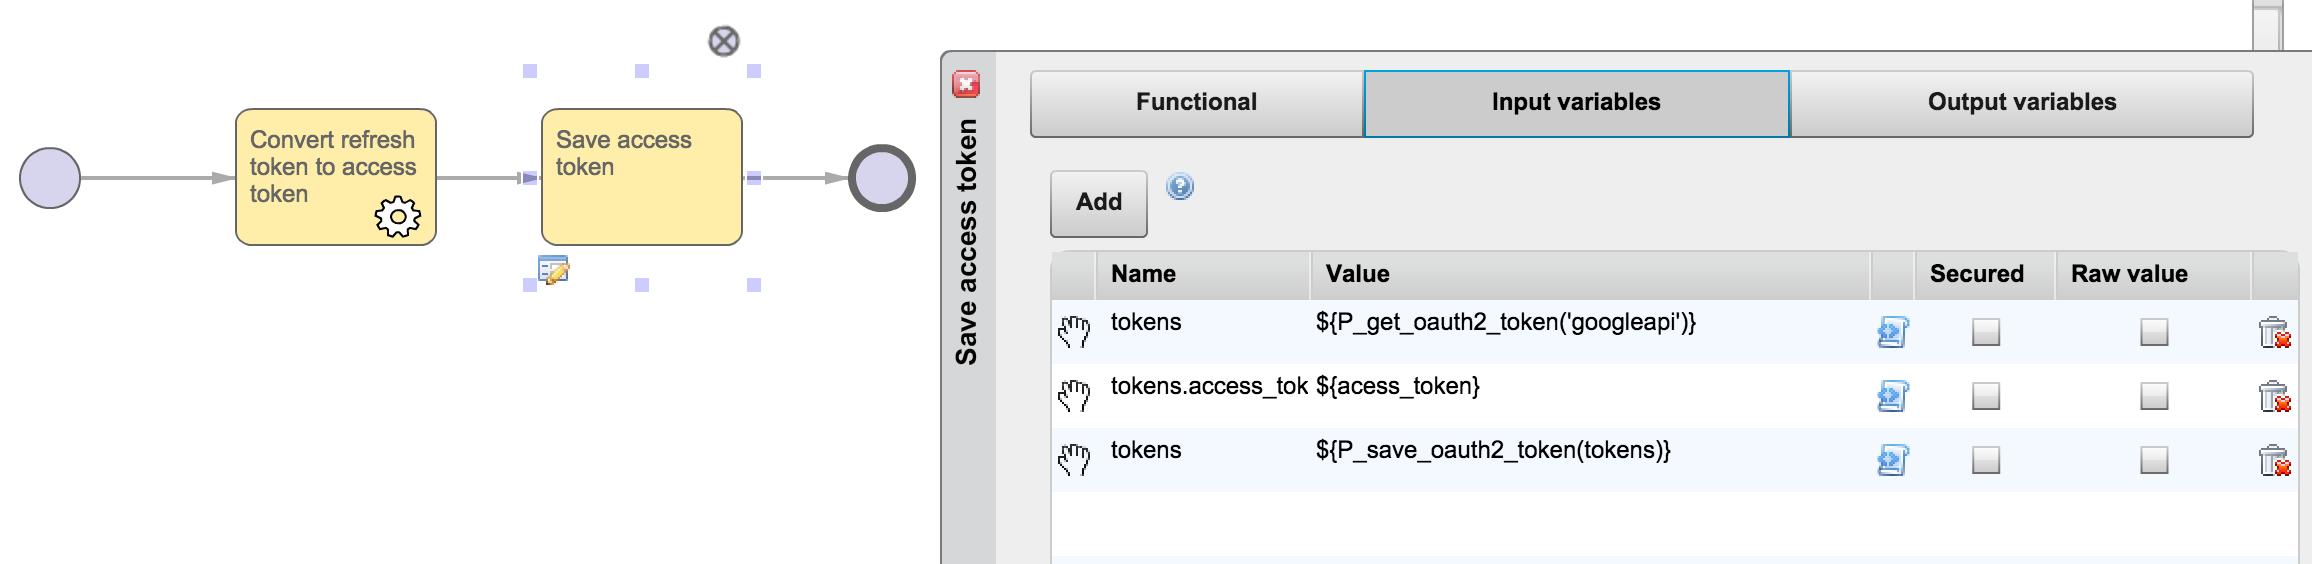 runmyprocess user guide » dropbox integration using oauth 2.0